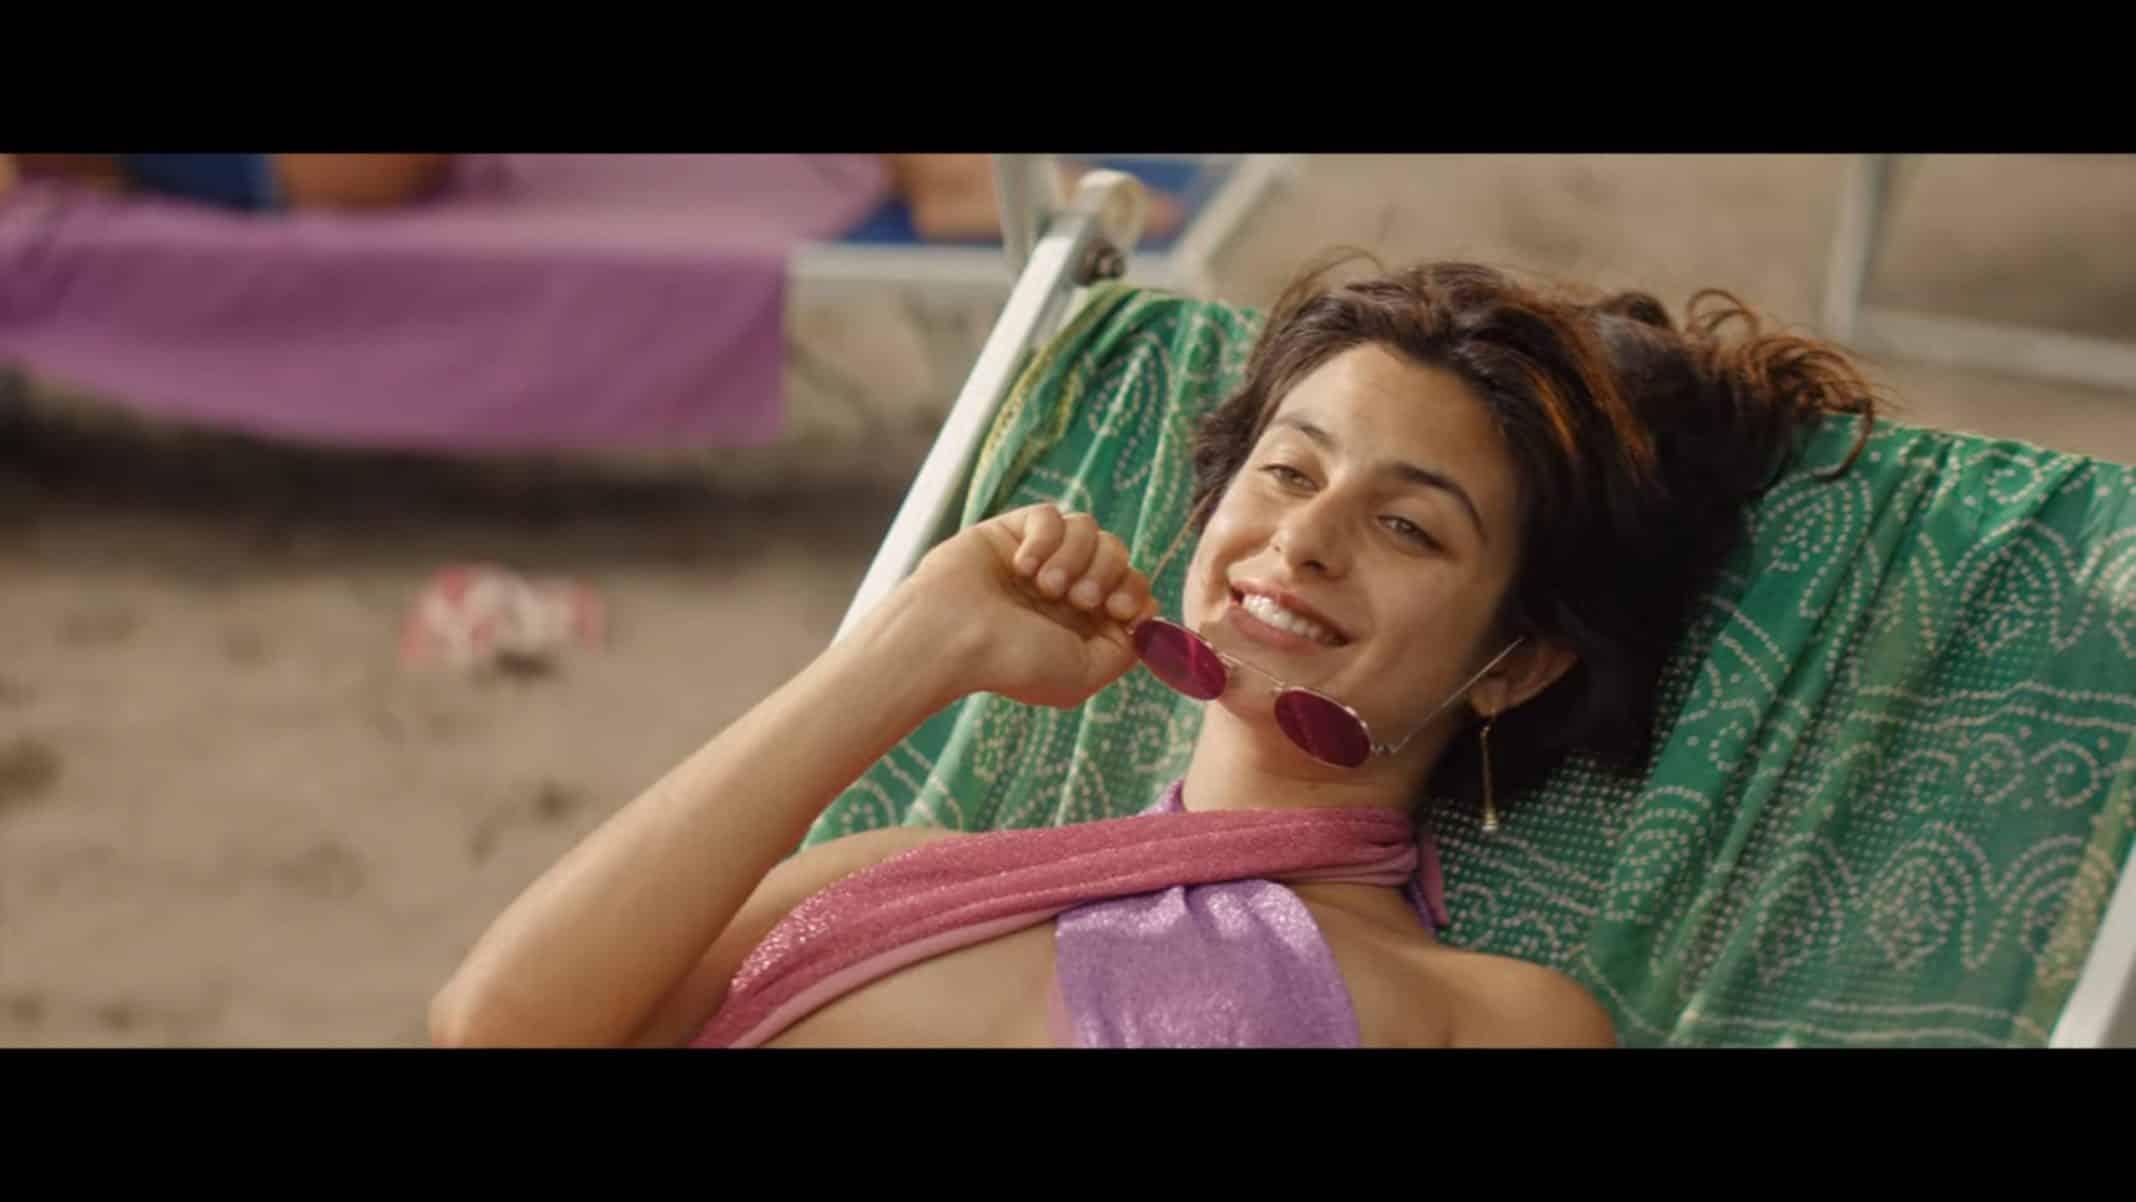 Guenda (Fotini Peluso) relaxing in her bikini | Under the Riccione Sun